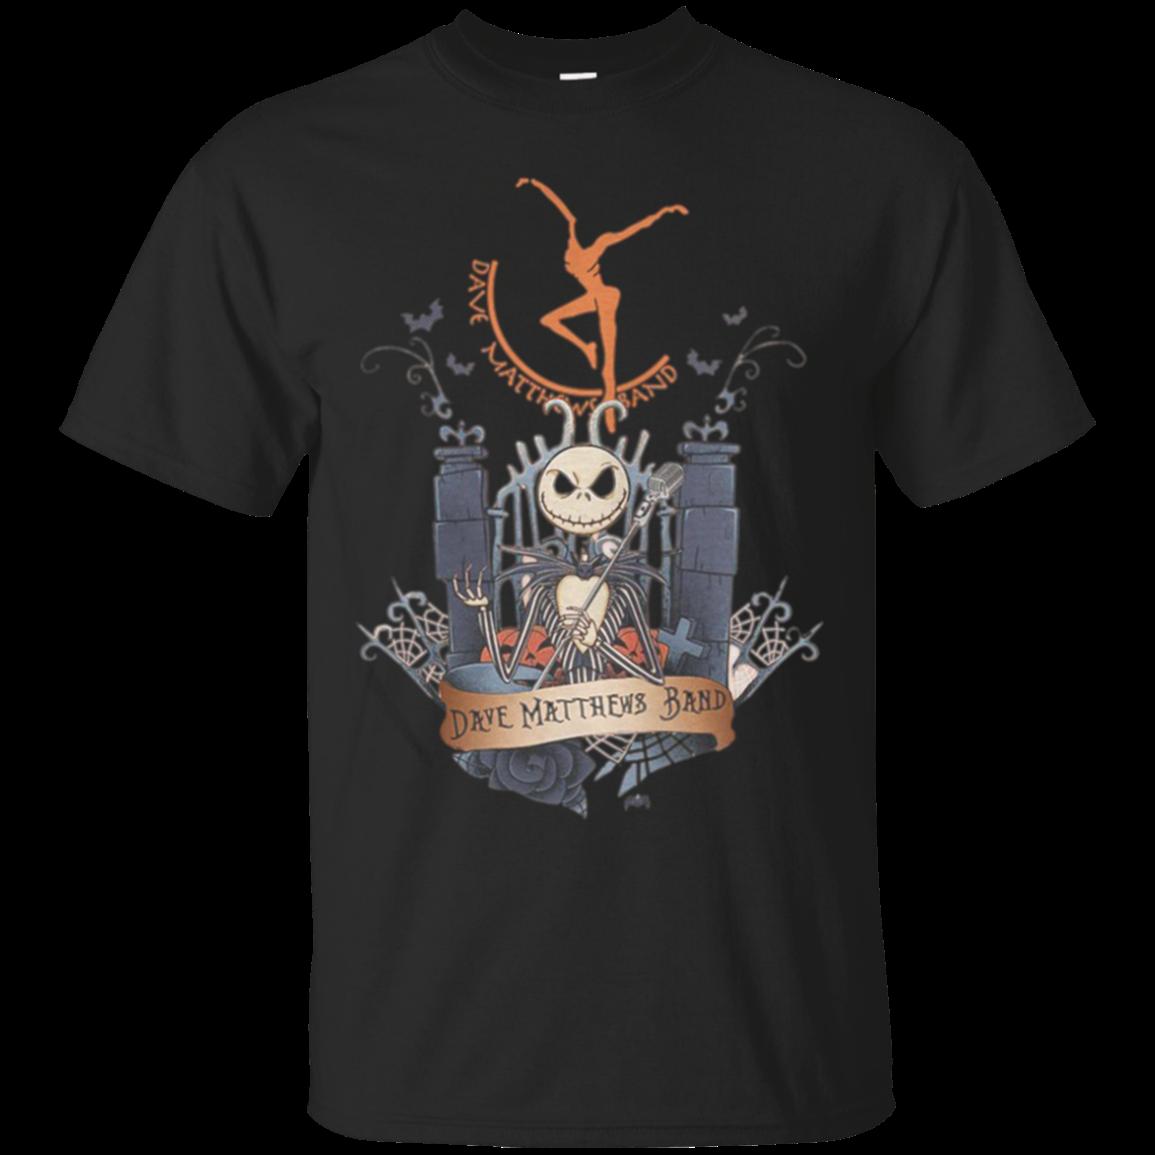 Dave Matthews Band Jack Skellington G200 Ultra T Shirt